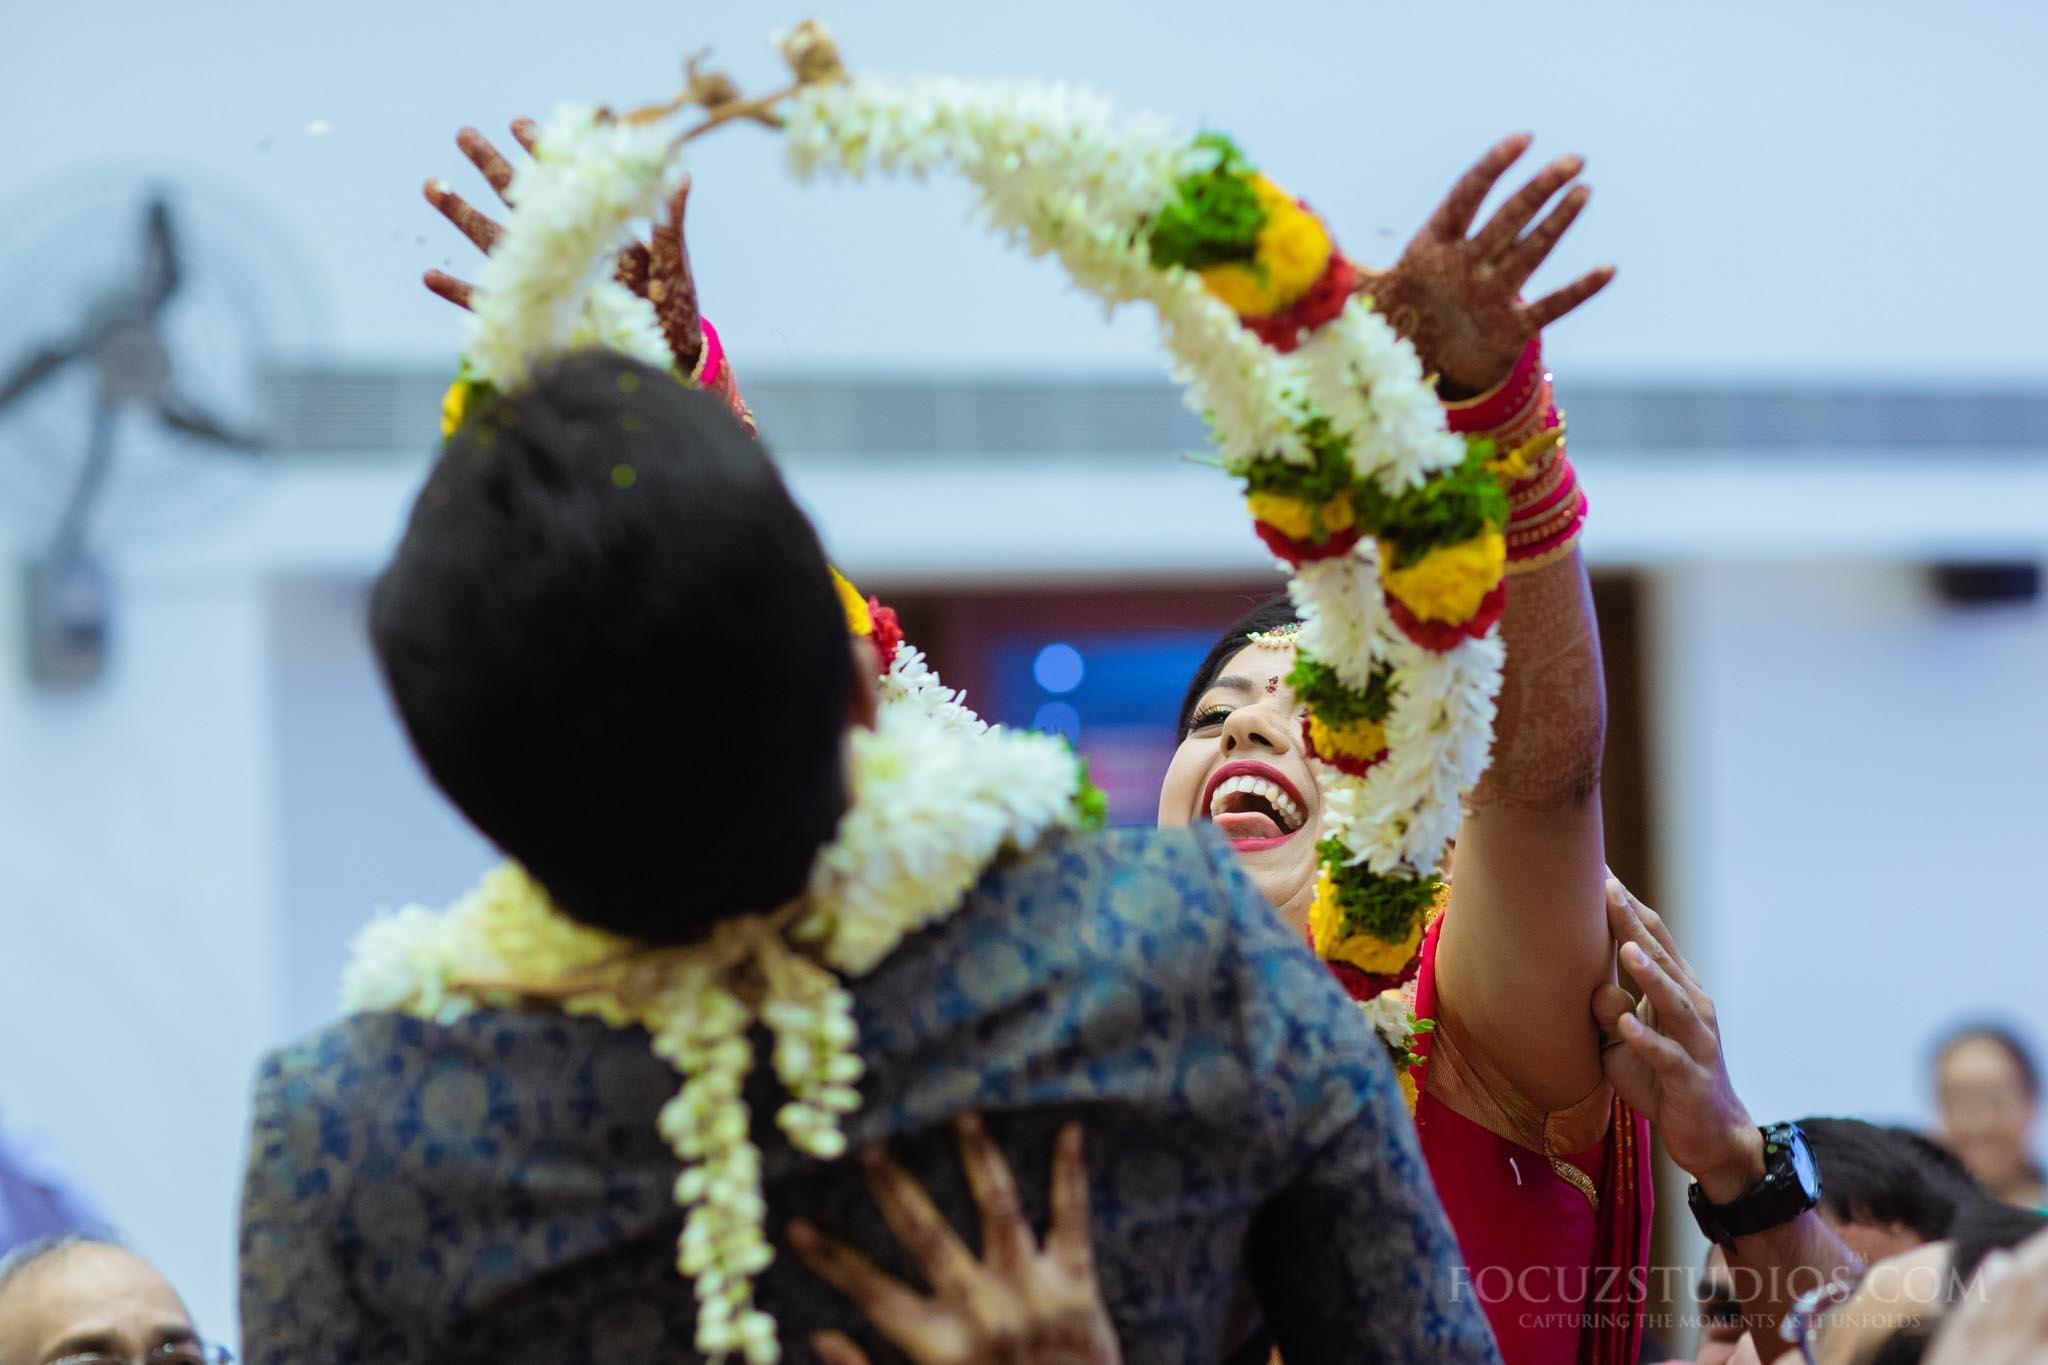 Best-of-2018-wedding-photography-focuz-studios-71